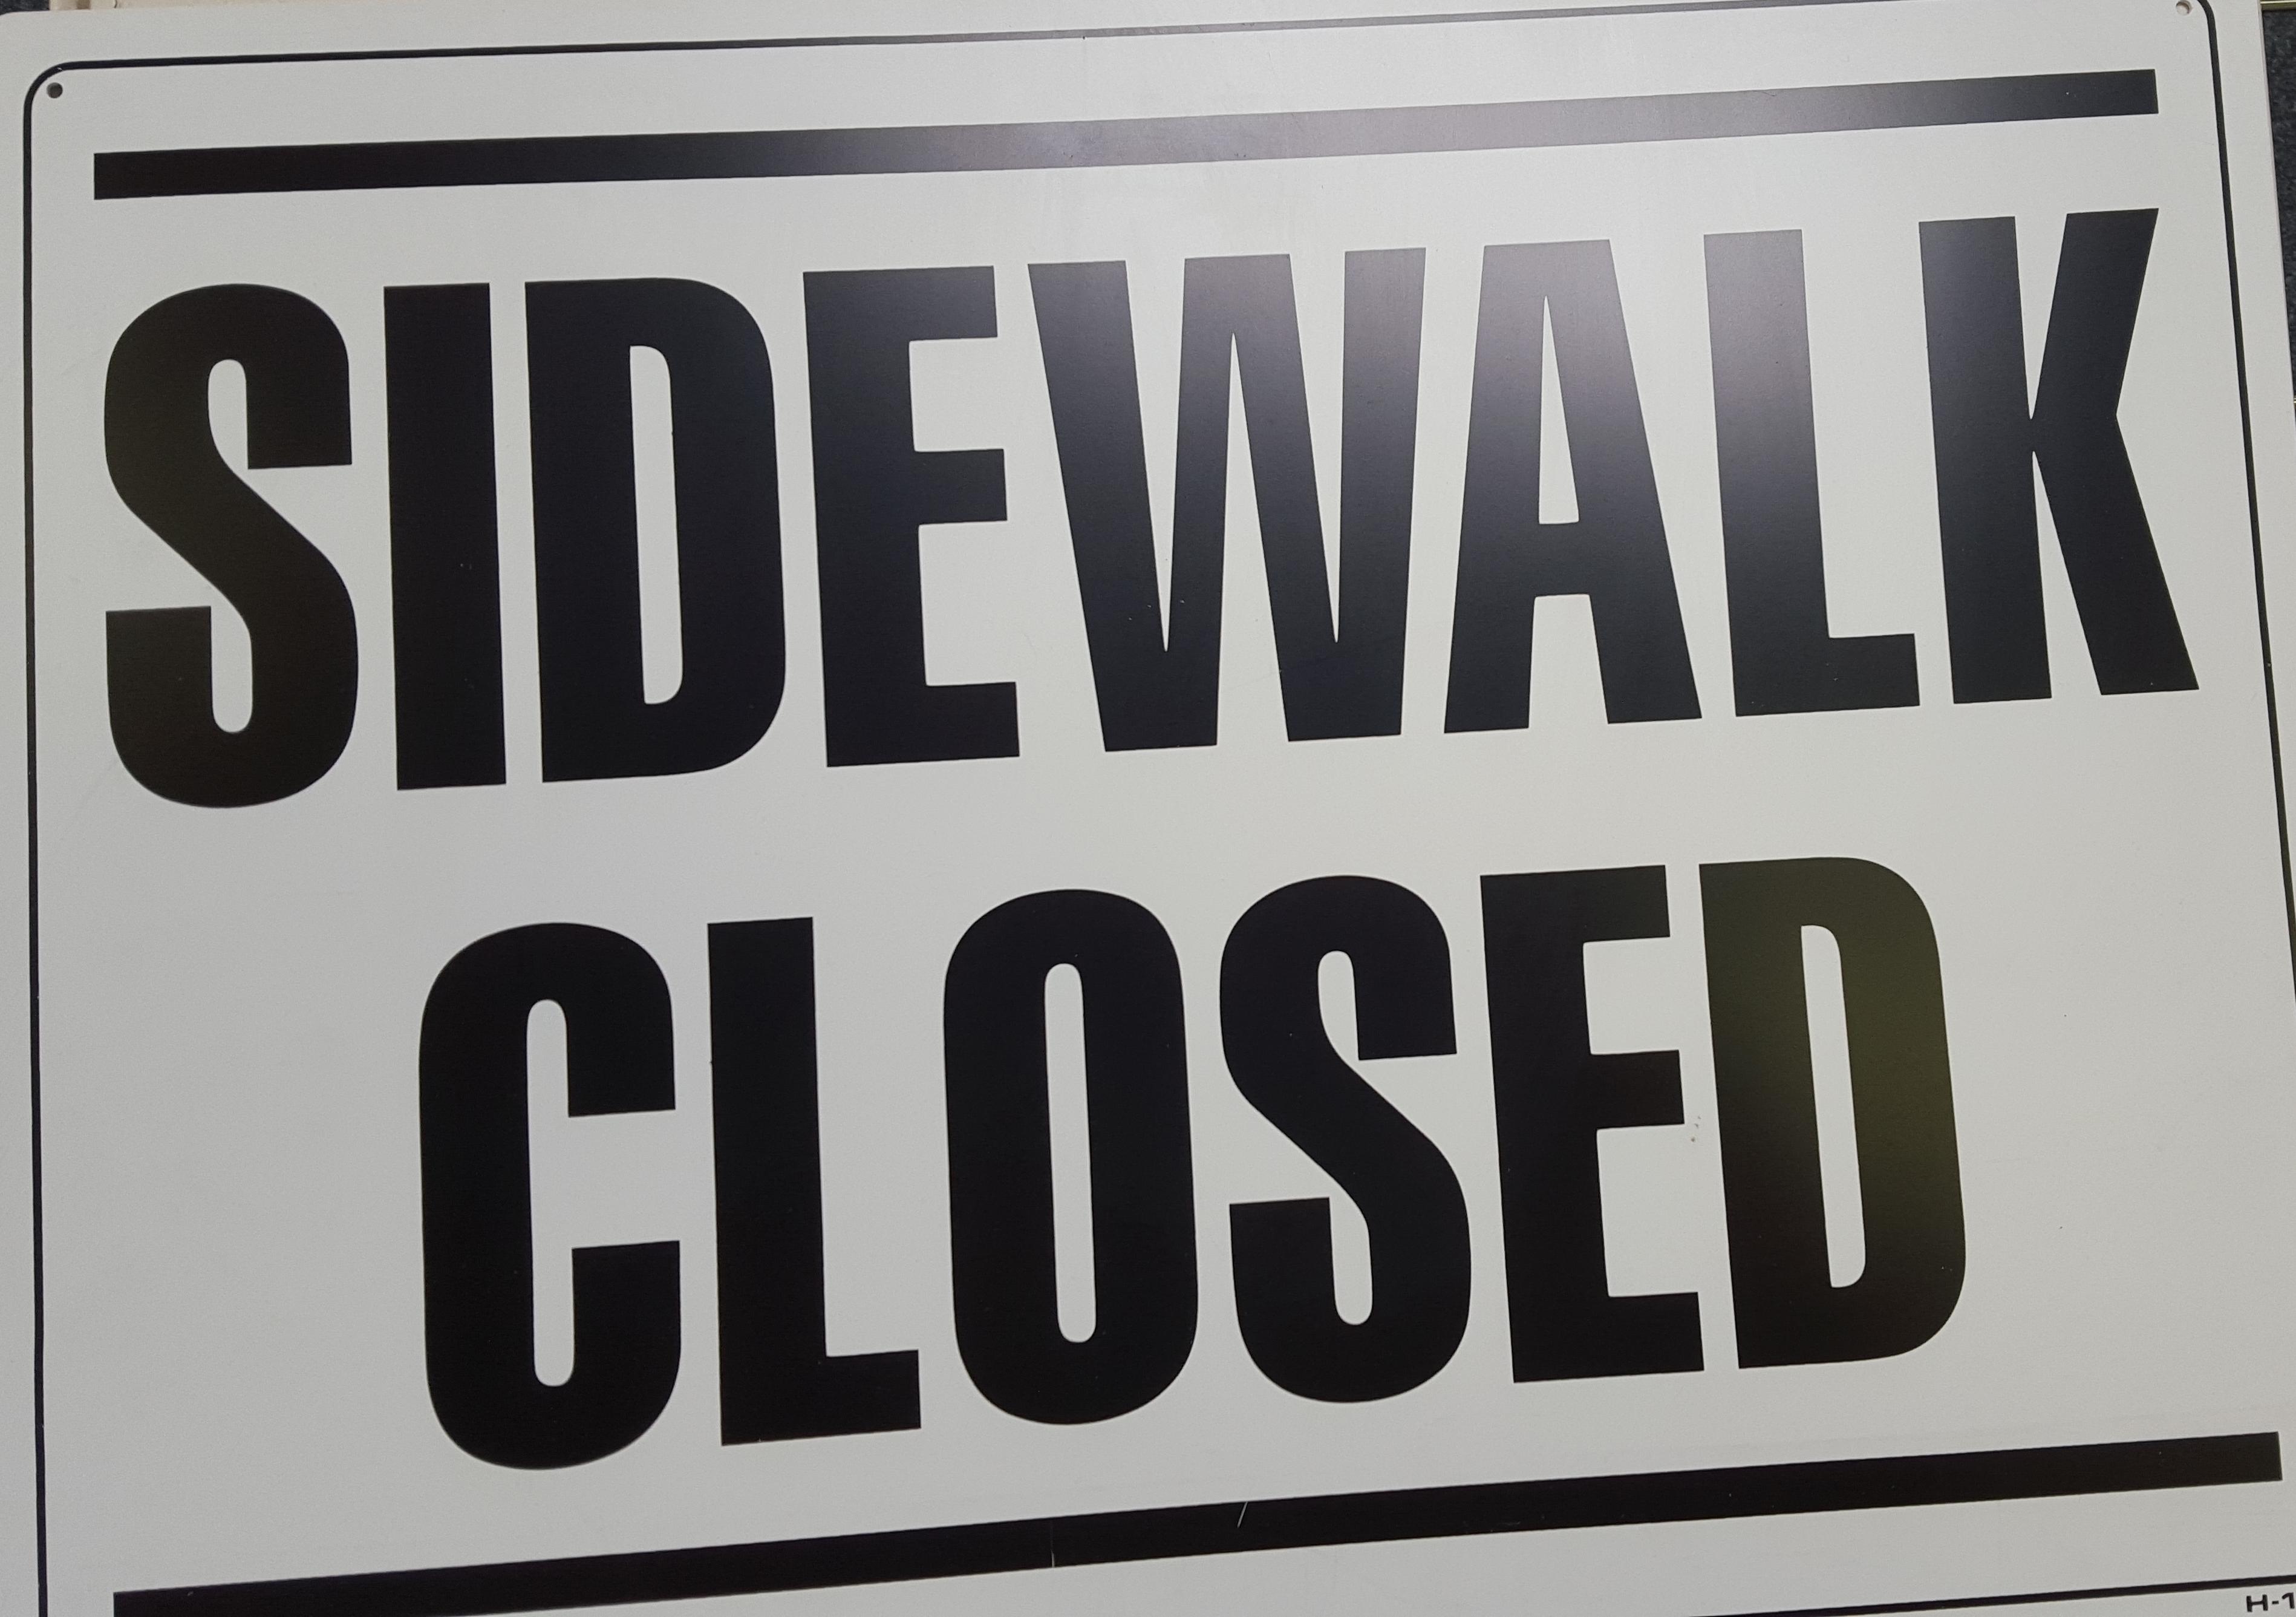 Sidewalk Closed Stock Sign